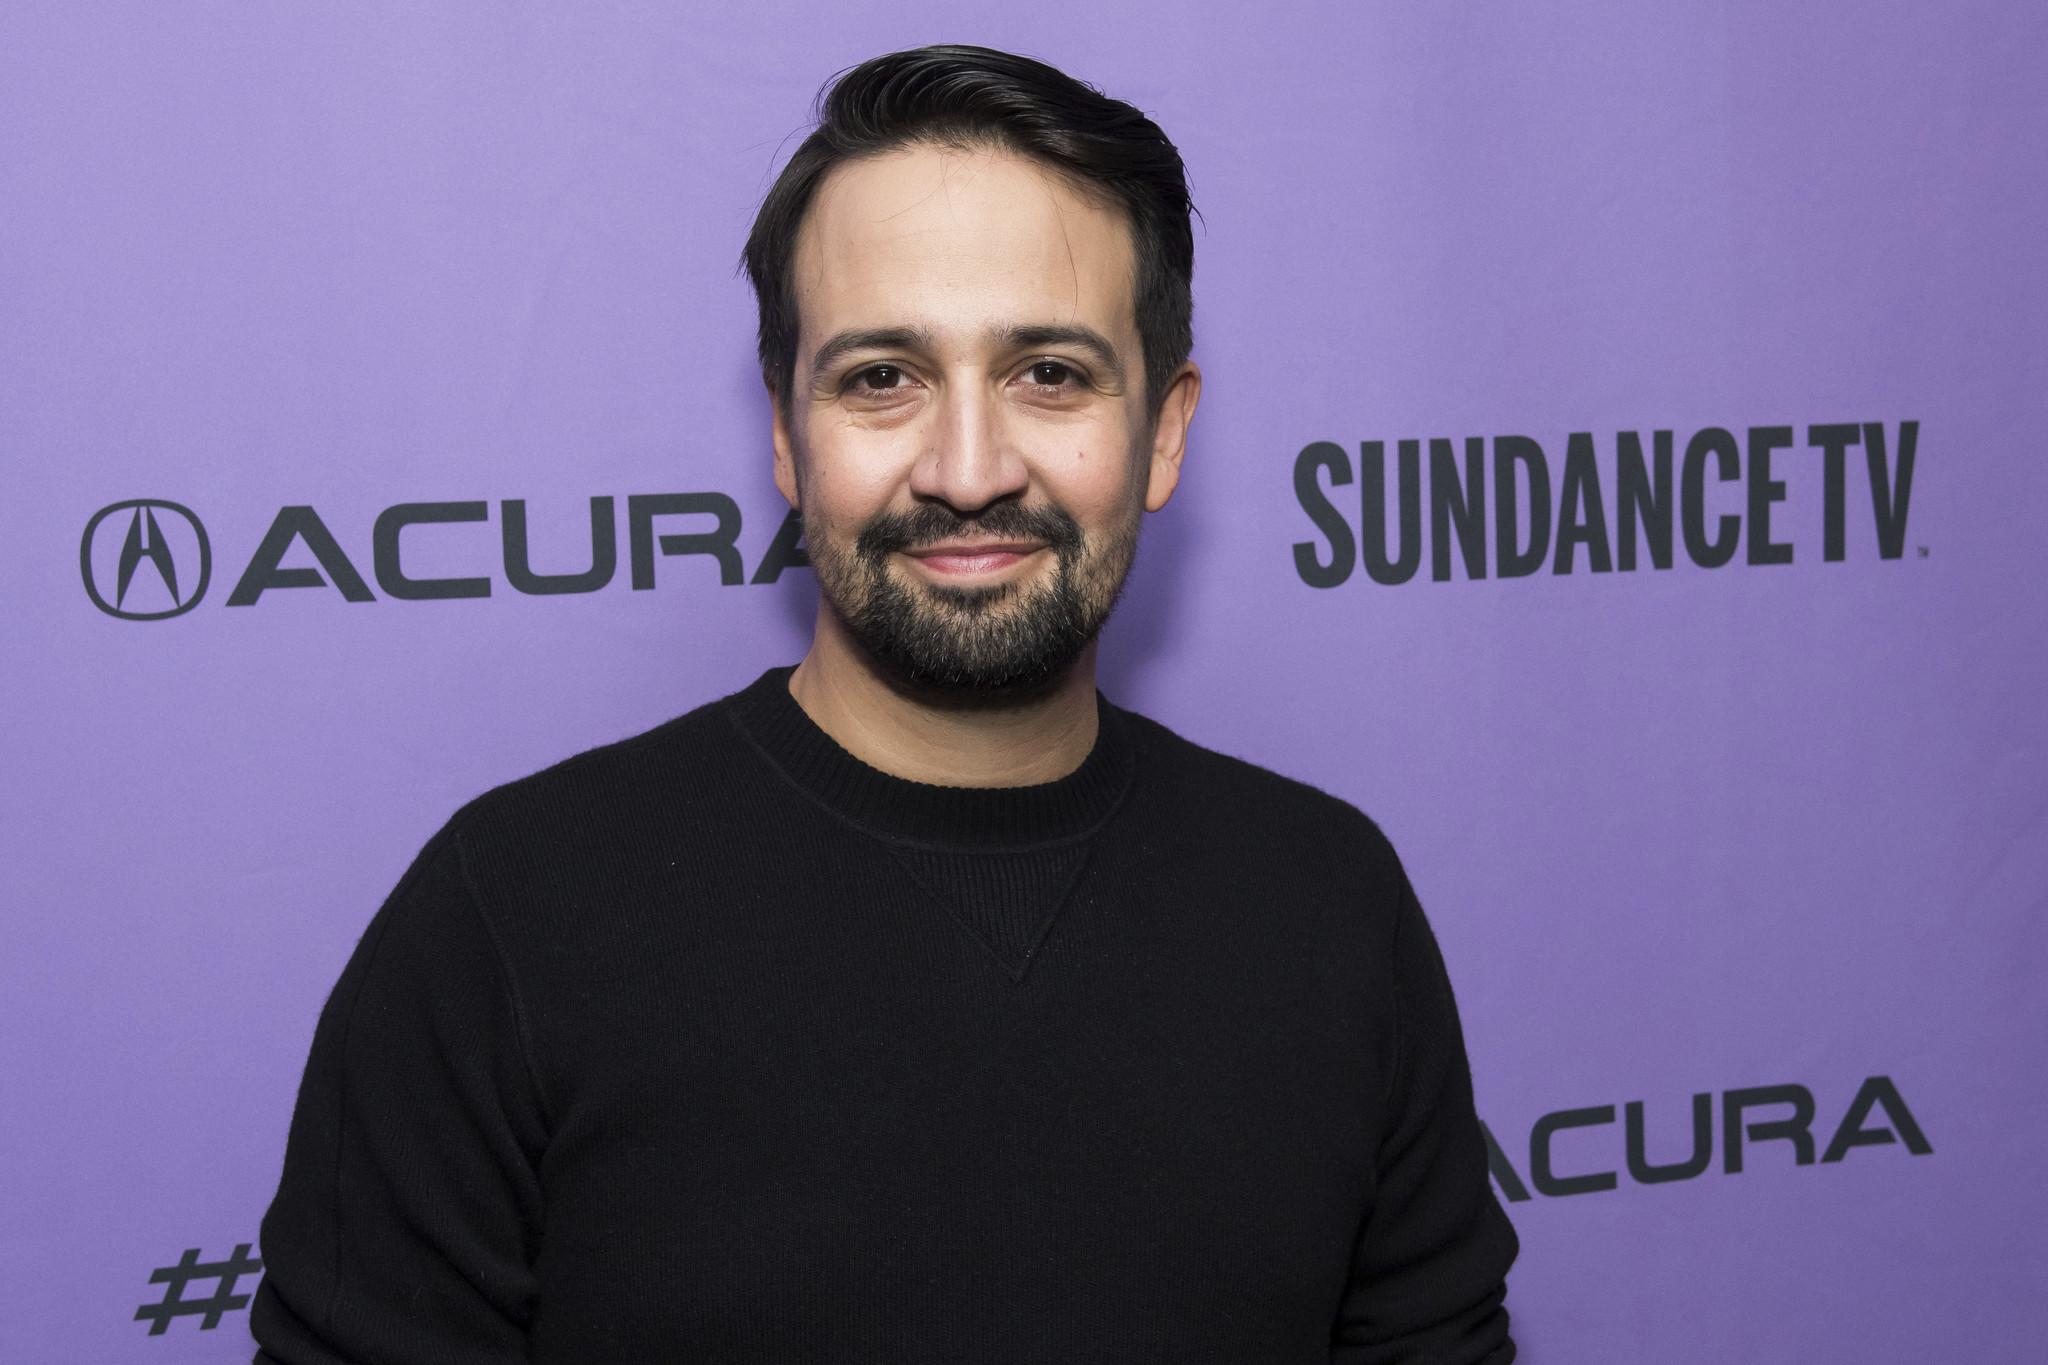 Lin-Manuel Miranda says he hopes filmed version of 'Hamilton' will get released 'sooner rather than later'